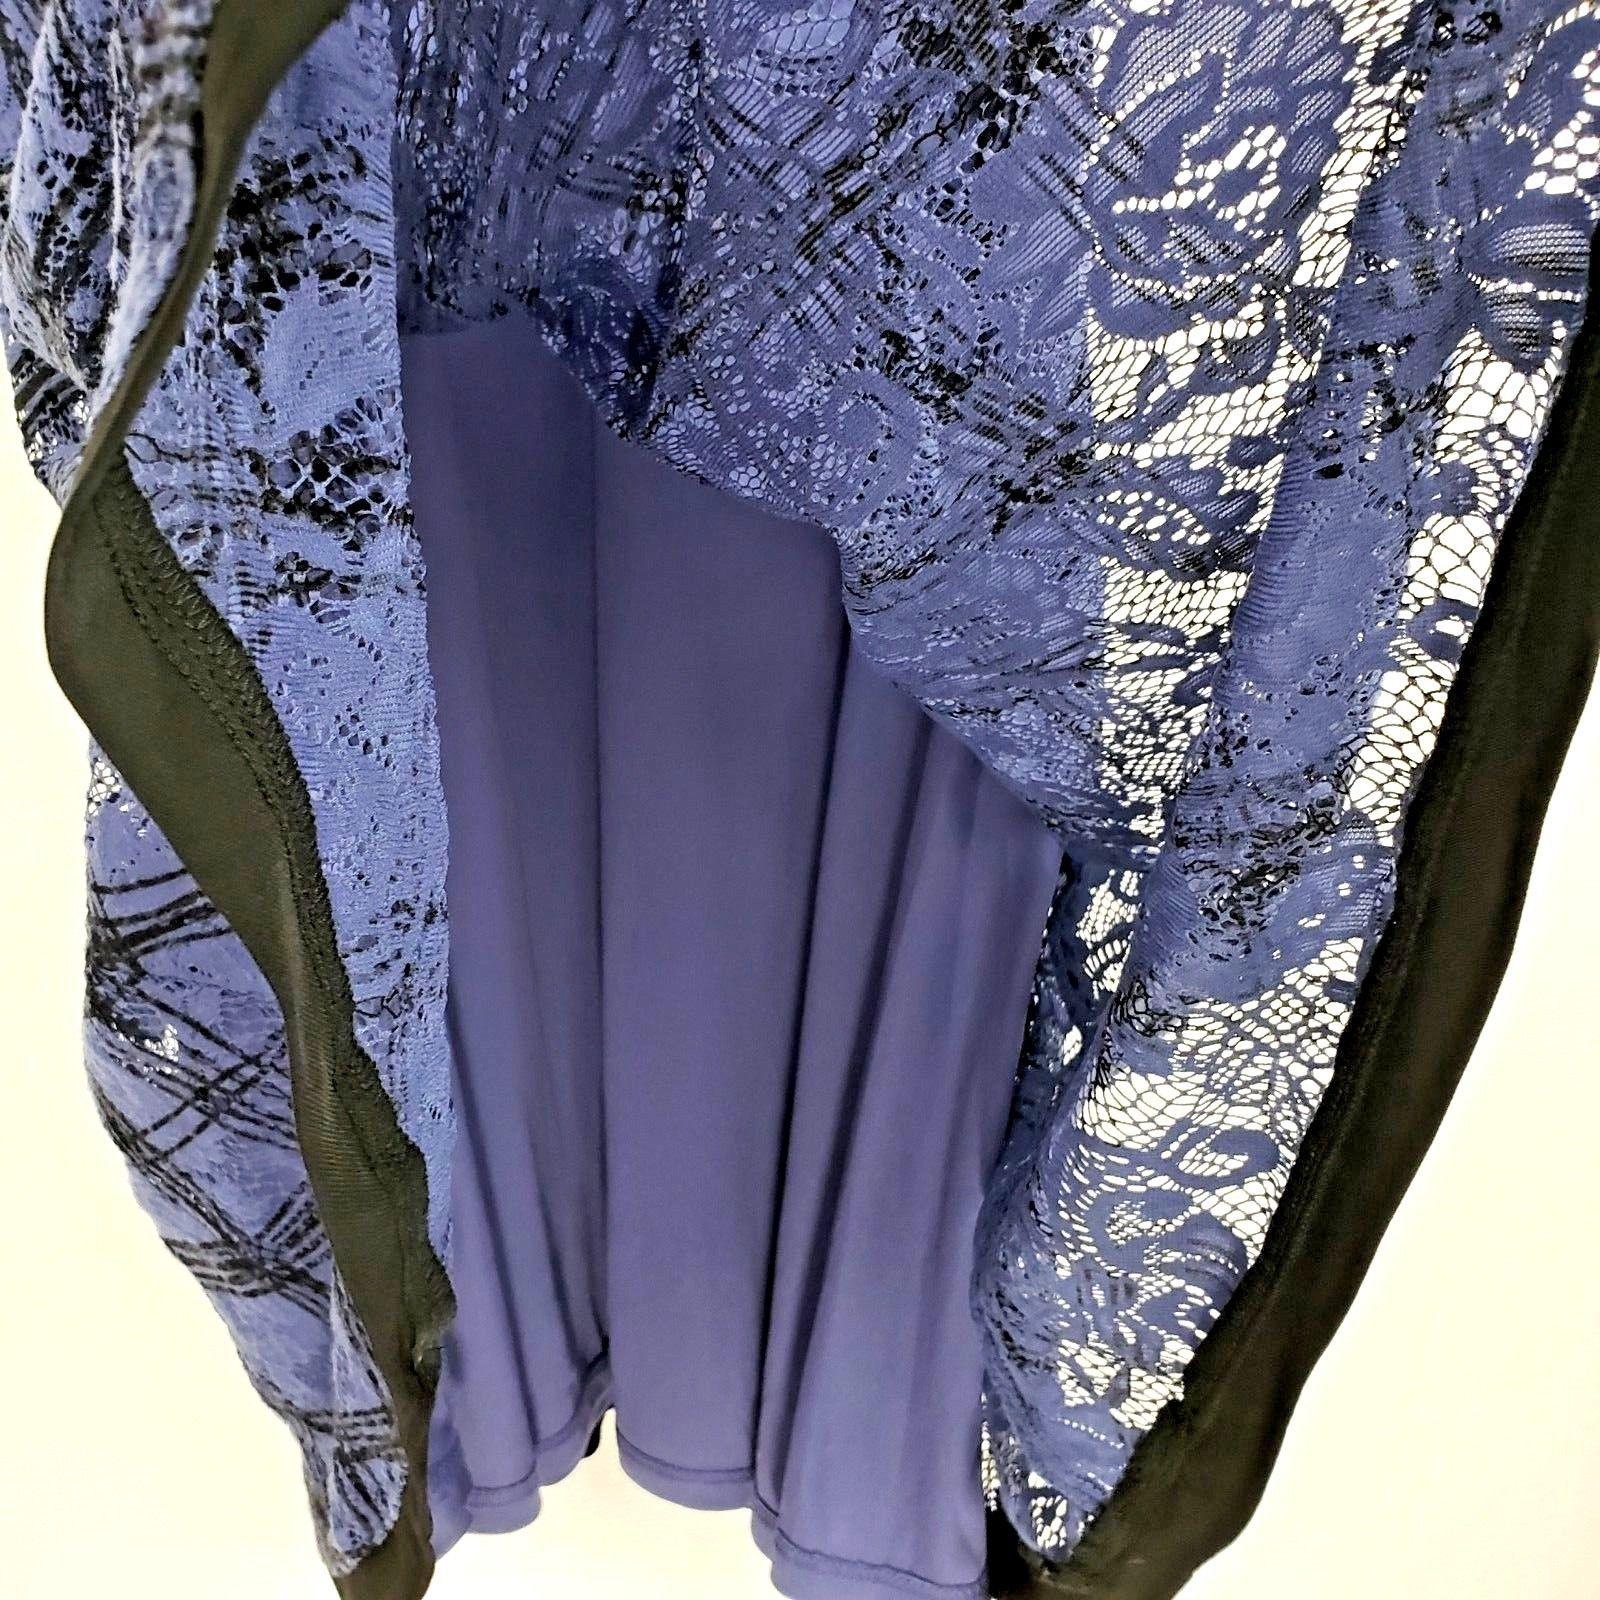 Ann Taylor Loft Purple Black Print Sleeveless Lace Fit n Flare Dress Size 8 NWT